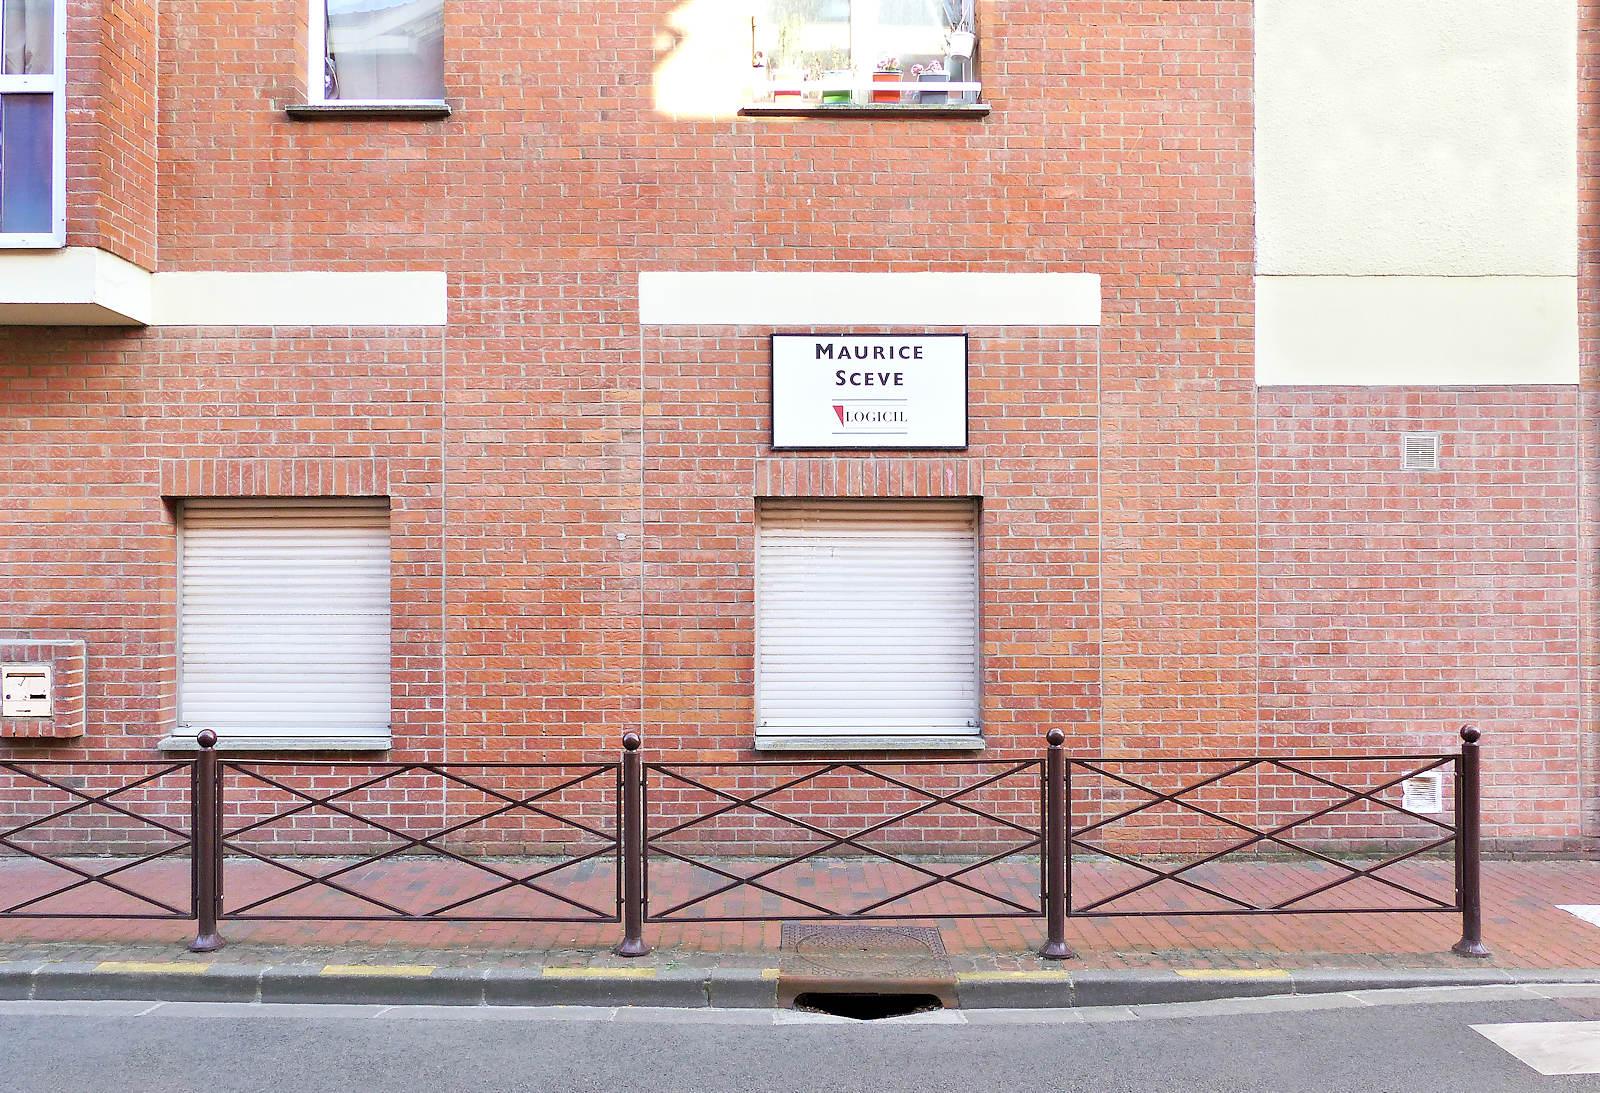 Résidence HLM Maurice Sève - Tourcoing, rue des Anges.